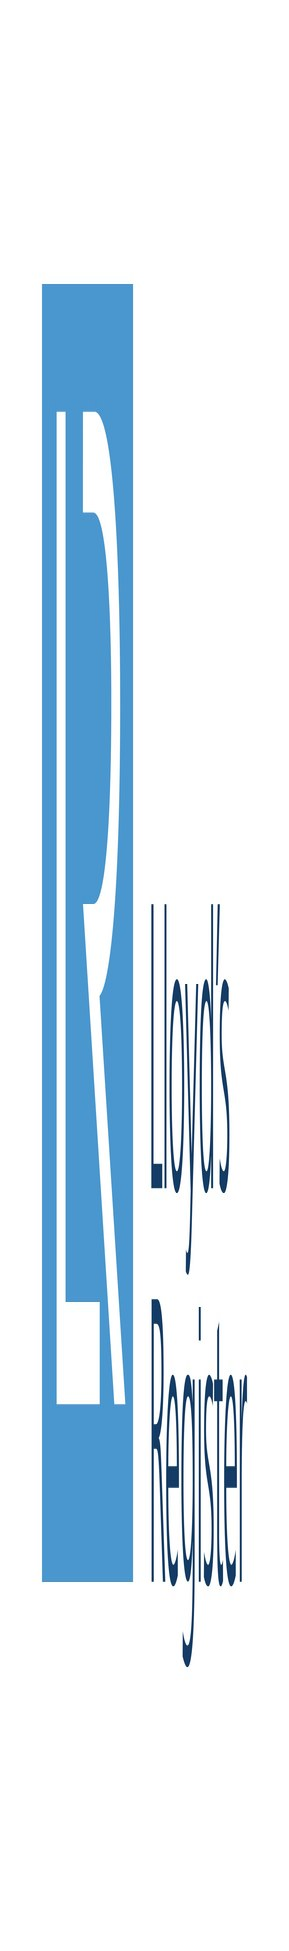 lloyd-s-register2019-seeklogo-01